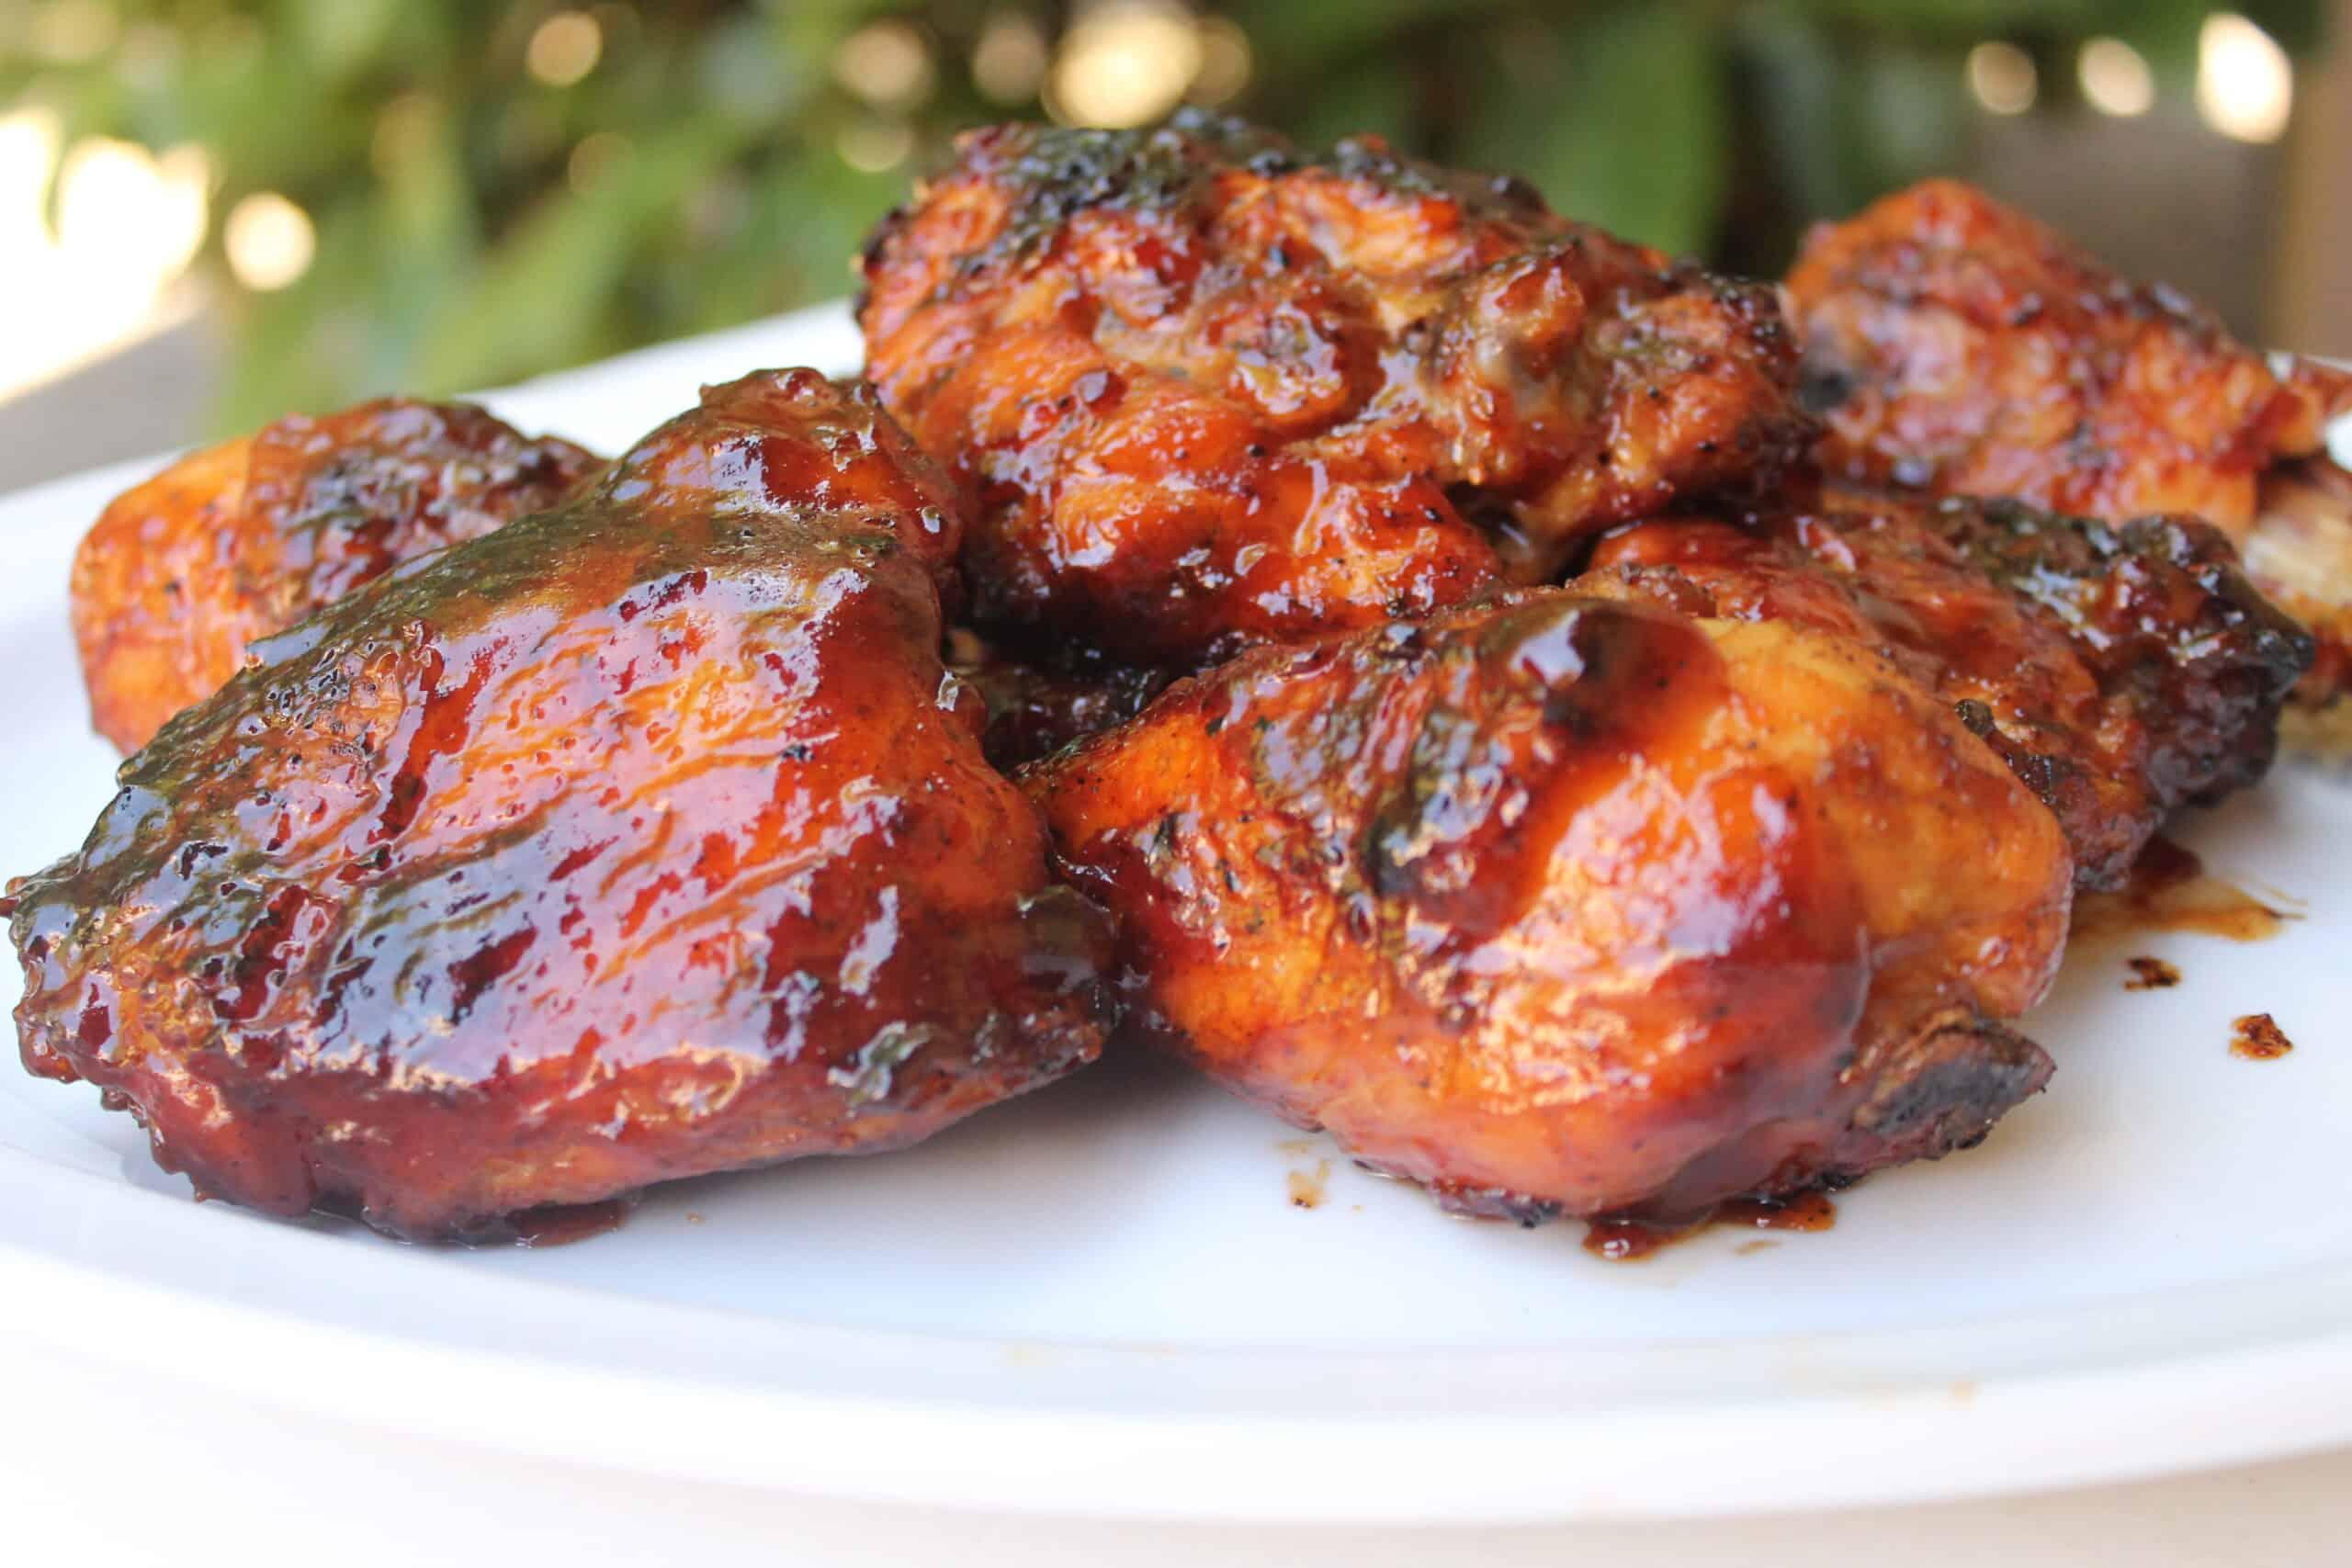 Hickory smoked bbq chicken